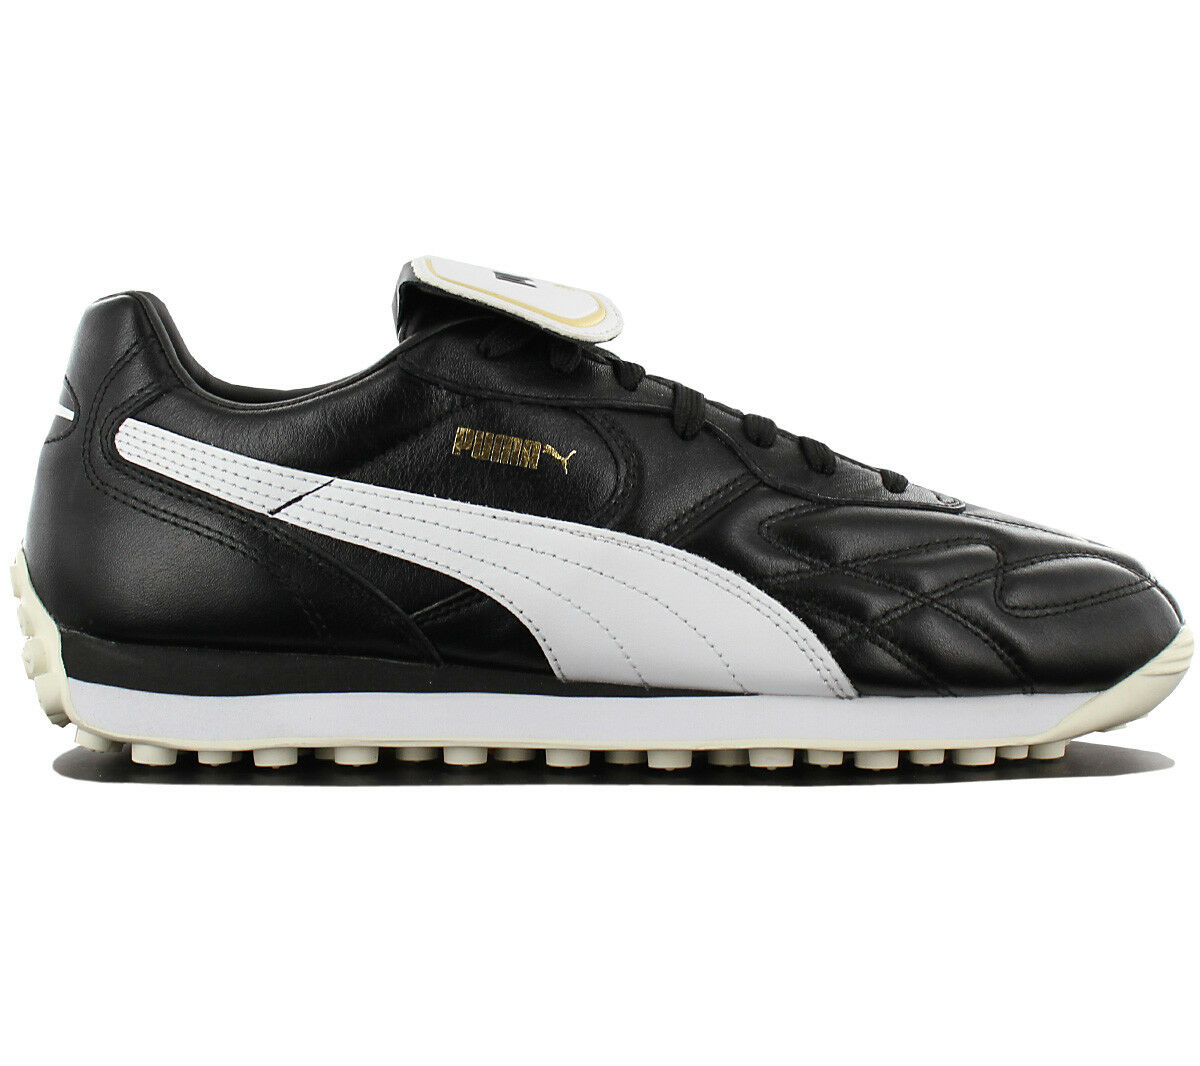 Puma King Avanti Premium Men's Sneakers Soccer Boots Leather 365482-01 New